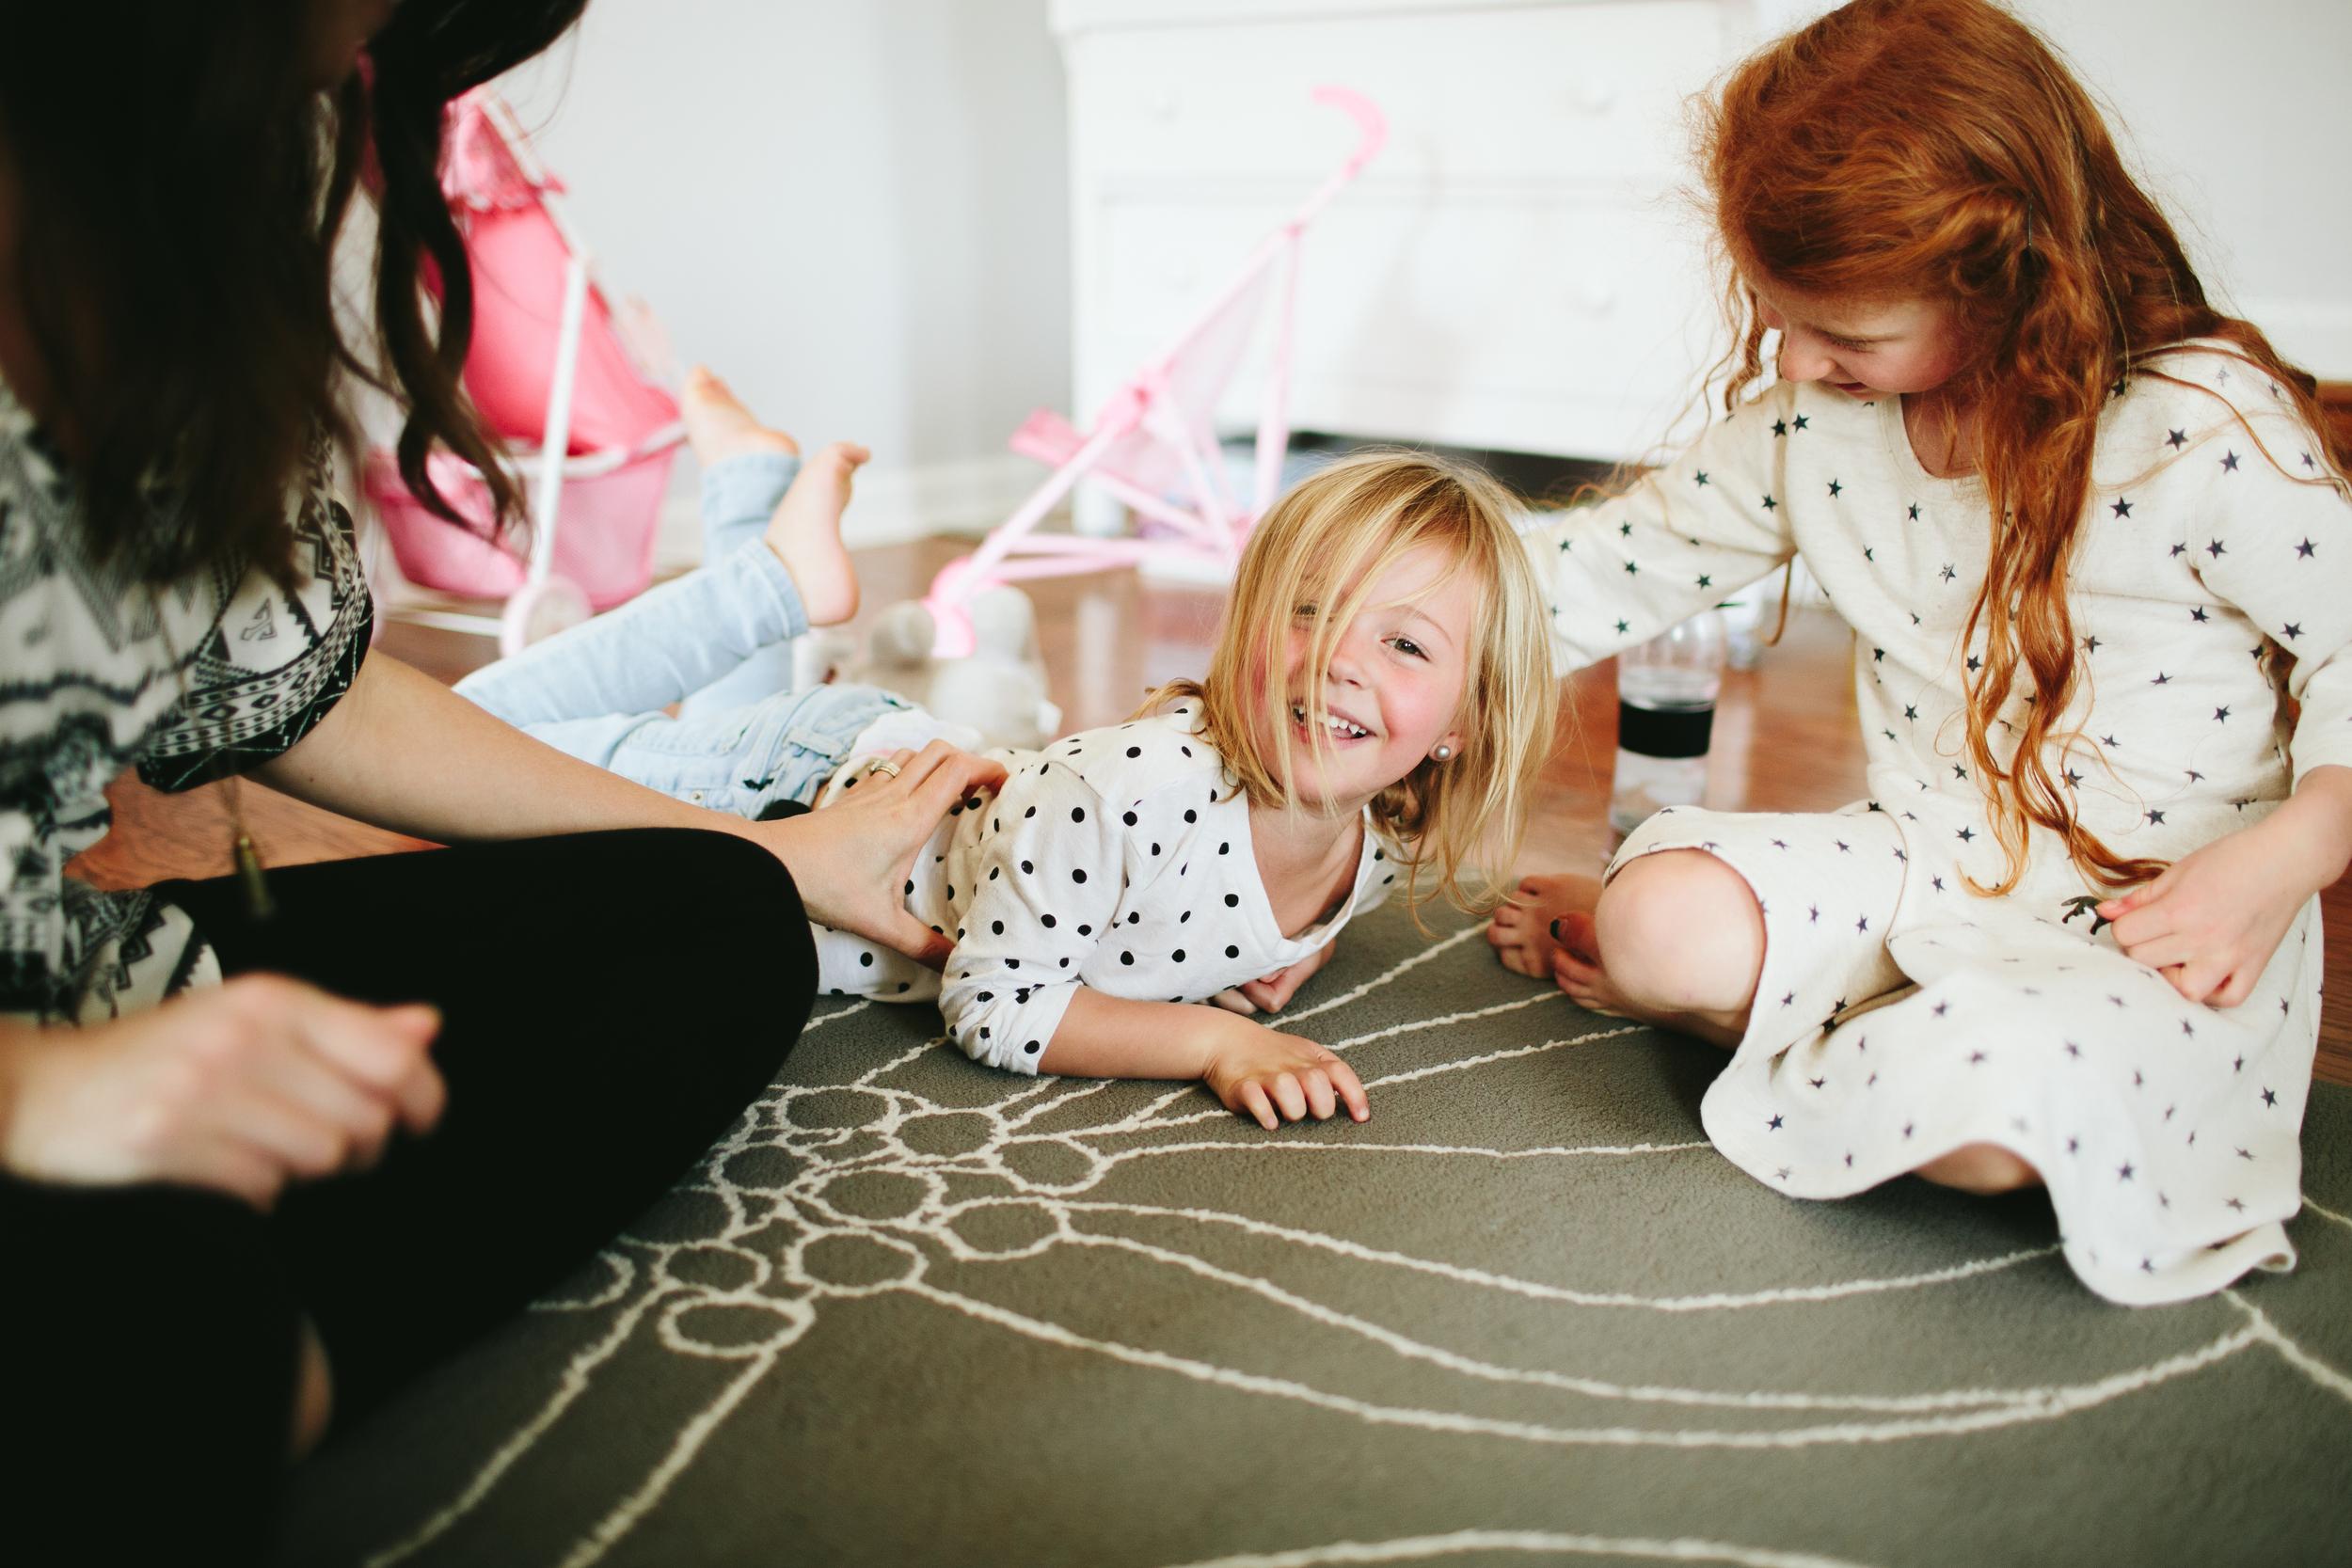 Asheville Family Photographer - Alicia White Photography-16.jpg